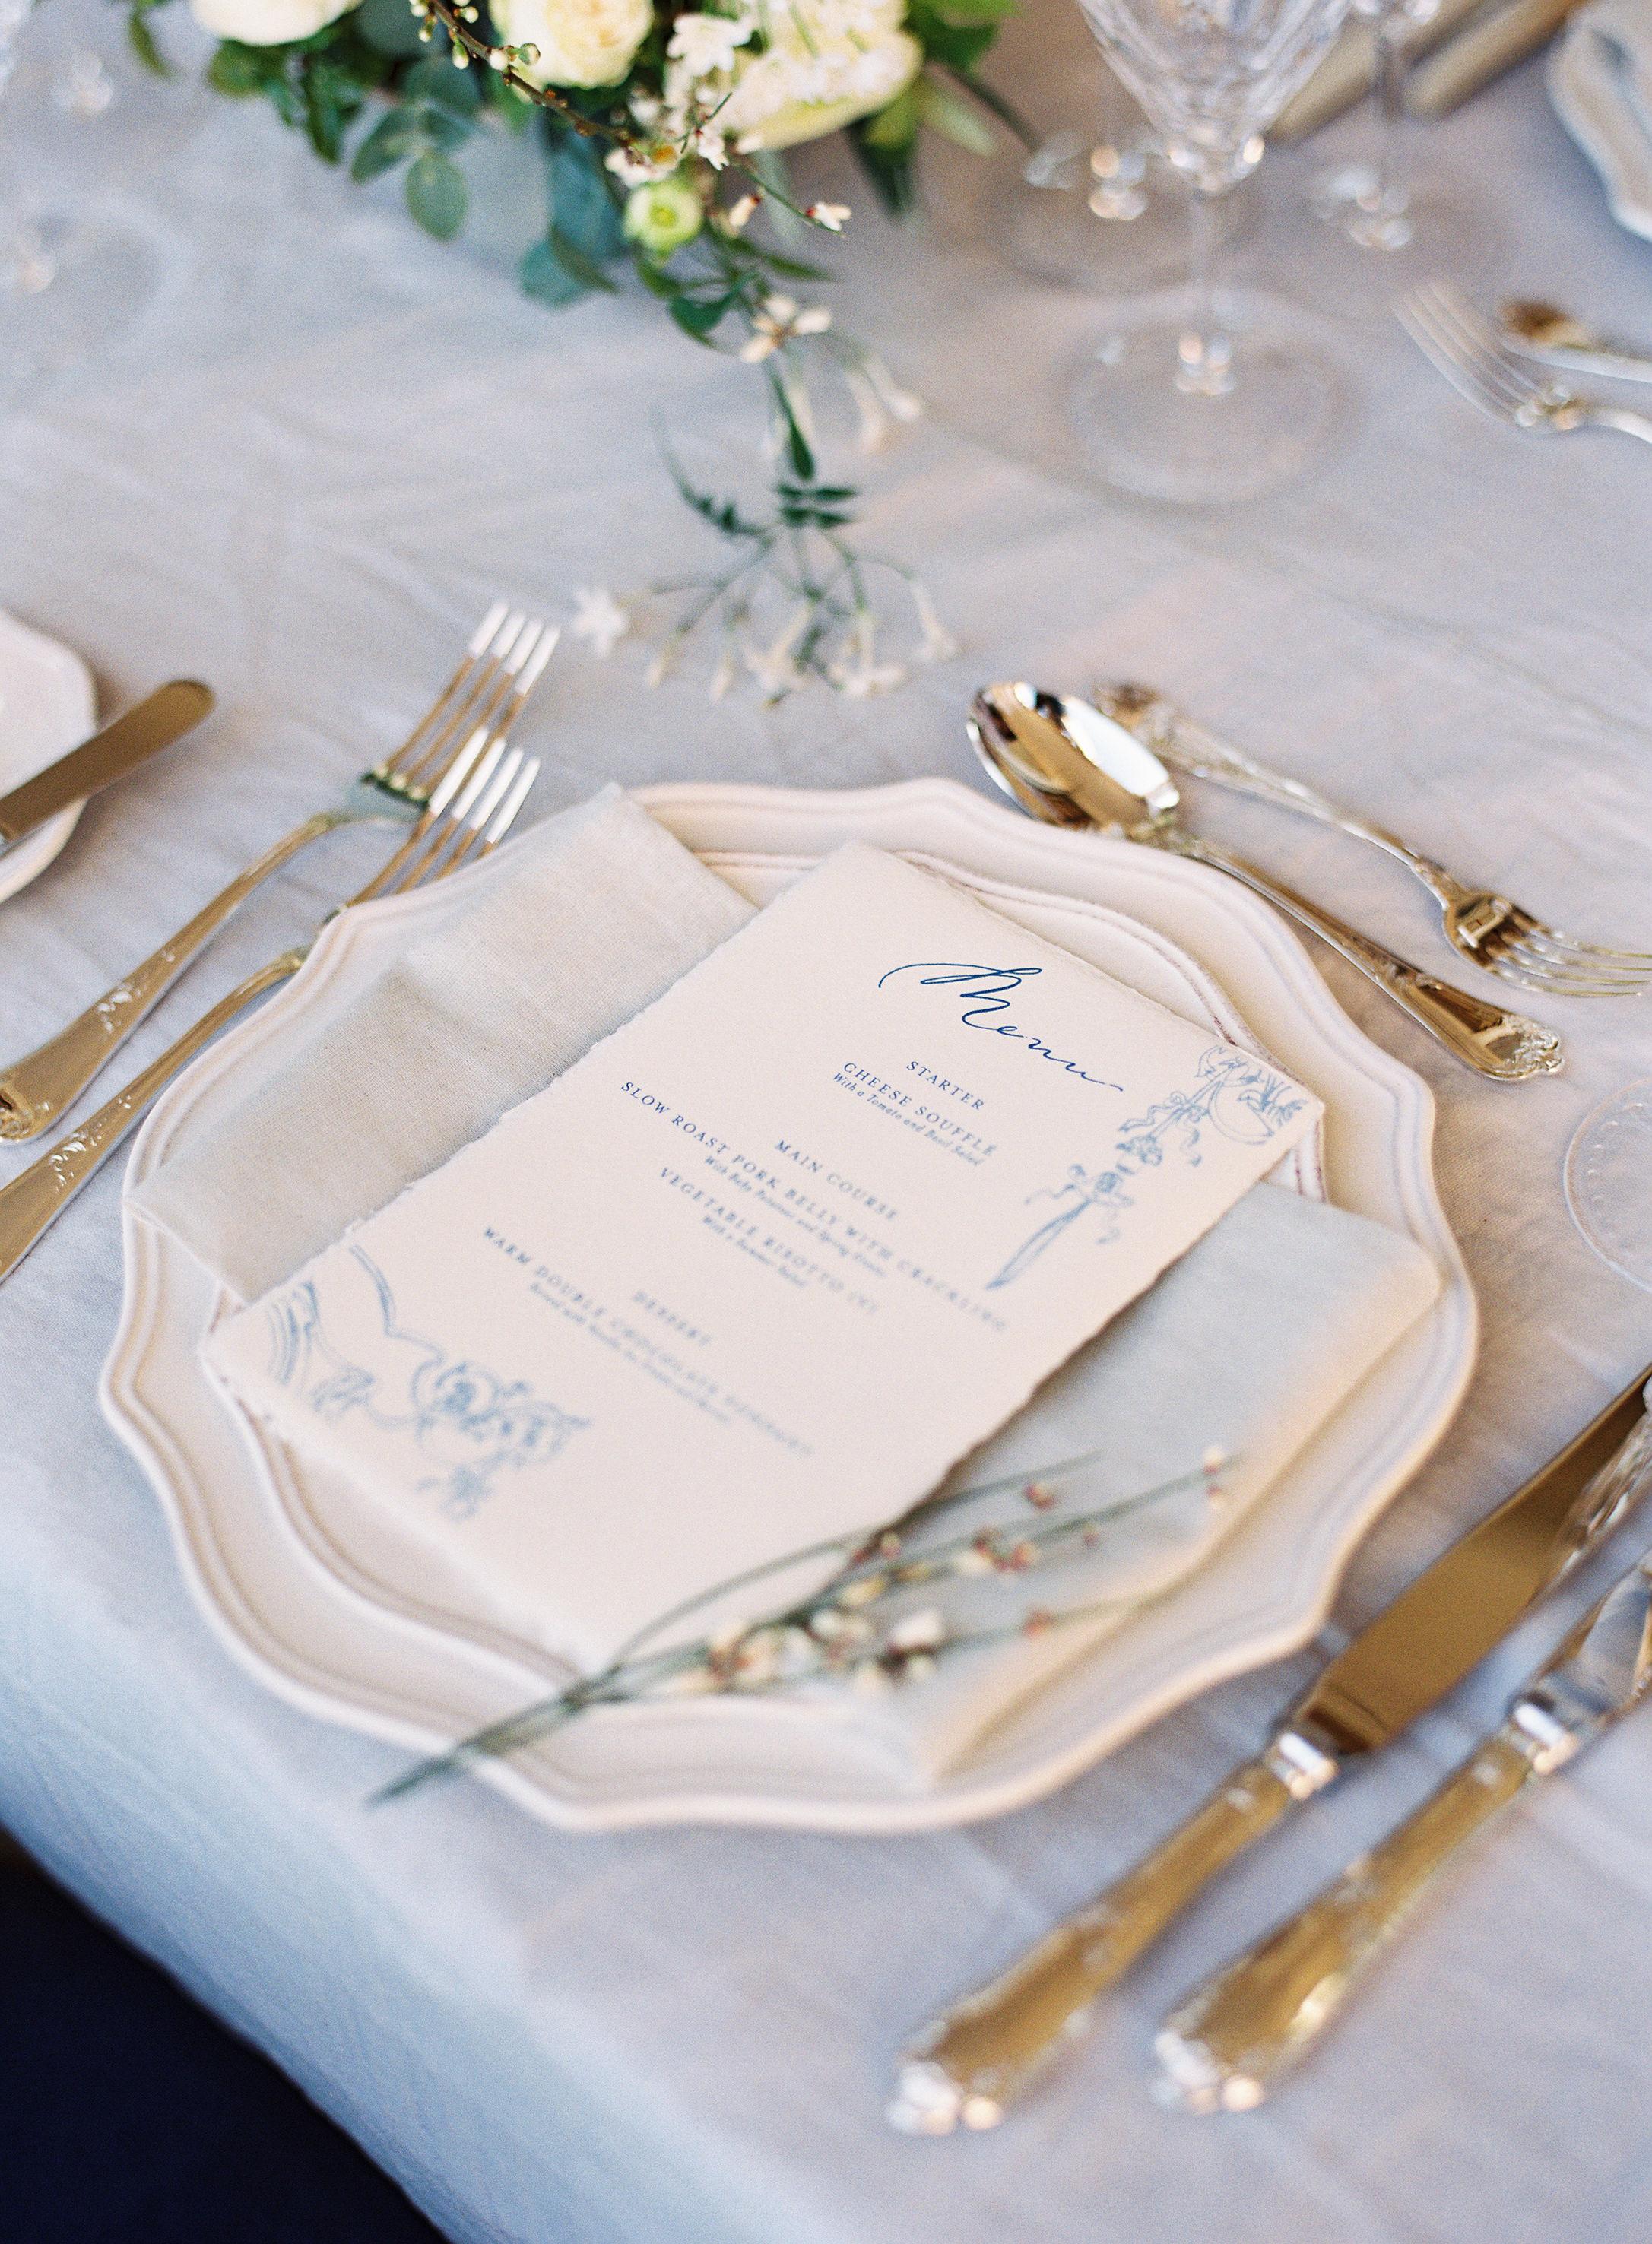 The Timeless Stylist-A Forgotten Love Story-Fine Art Wedding Editorial-Heirloom Wedding Styling 48.jpg